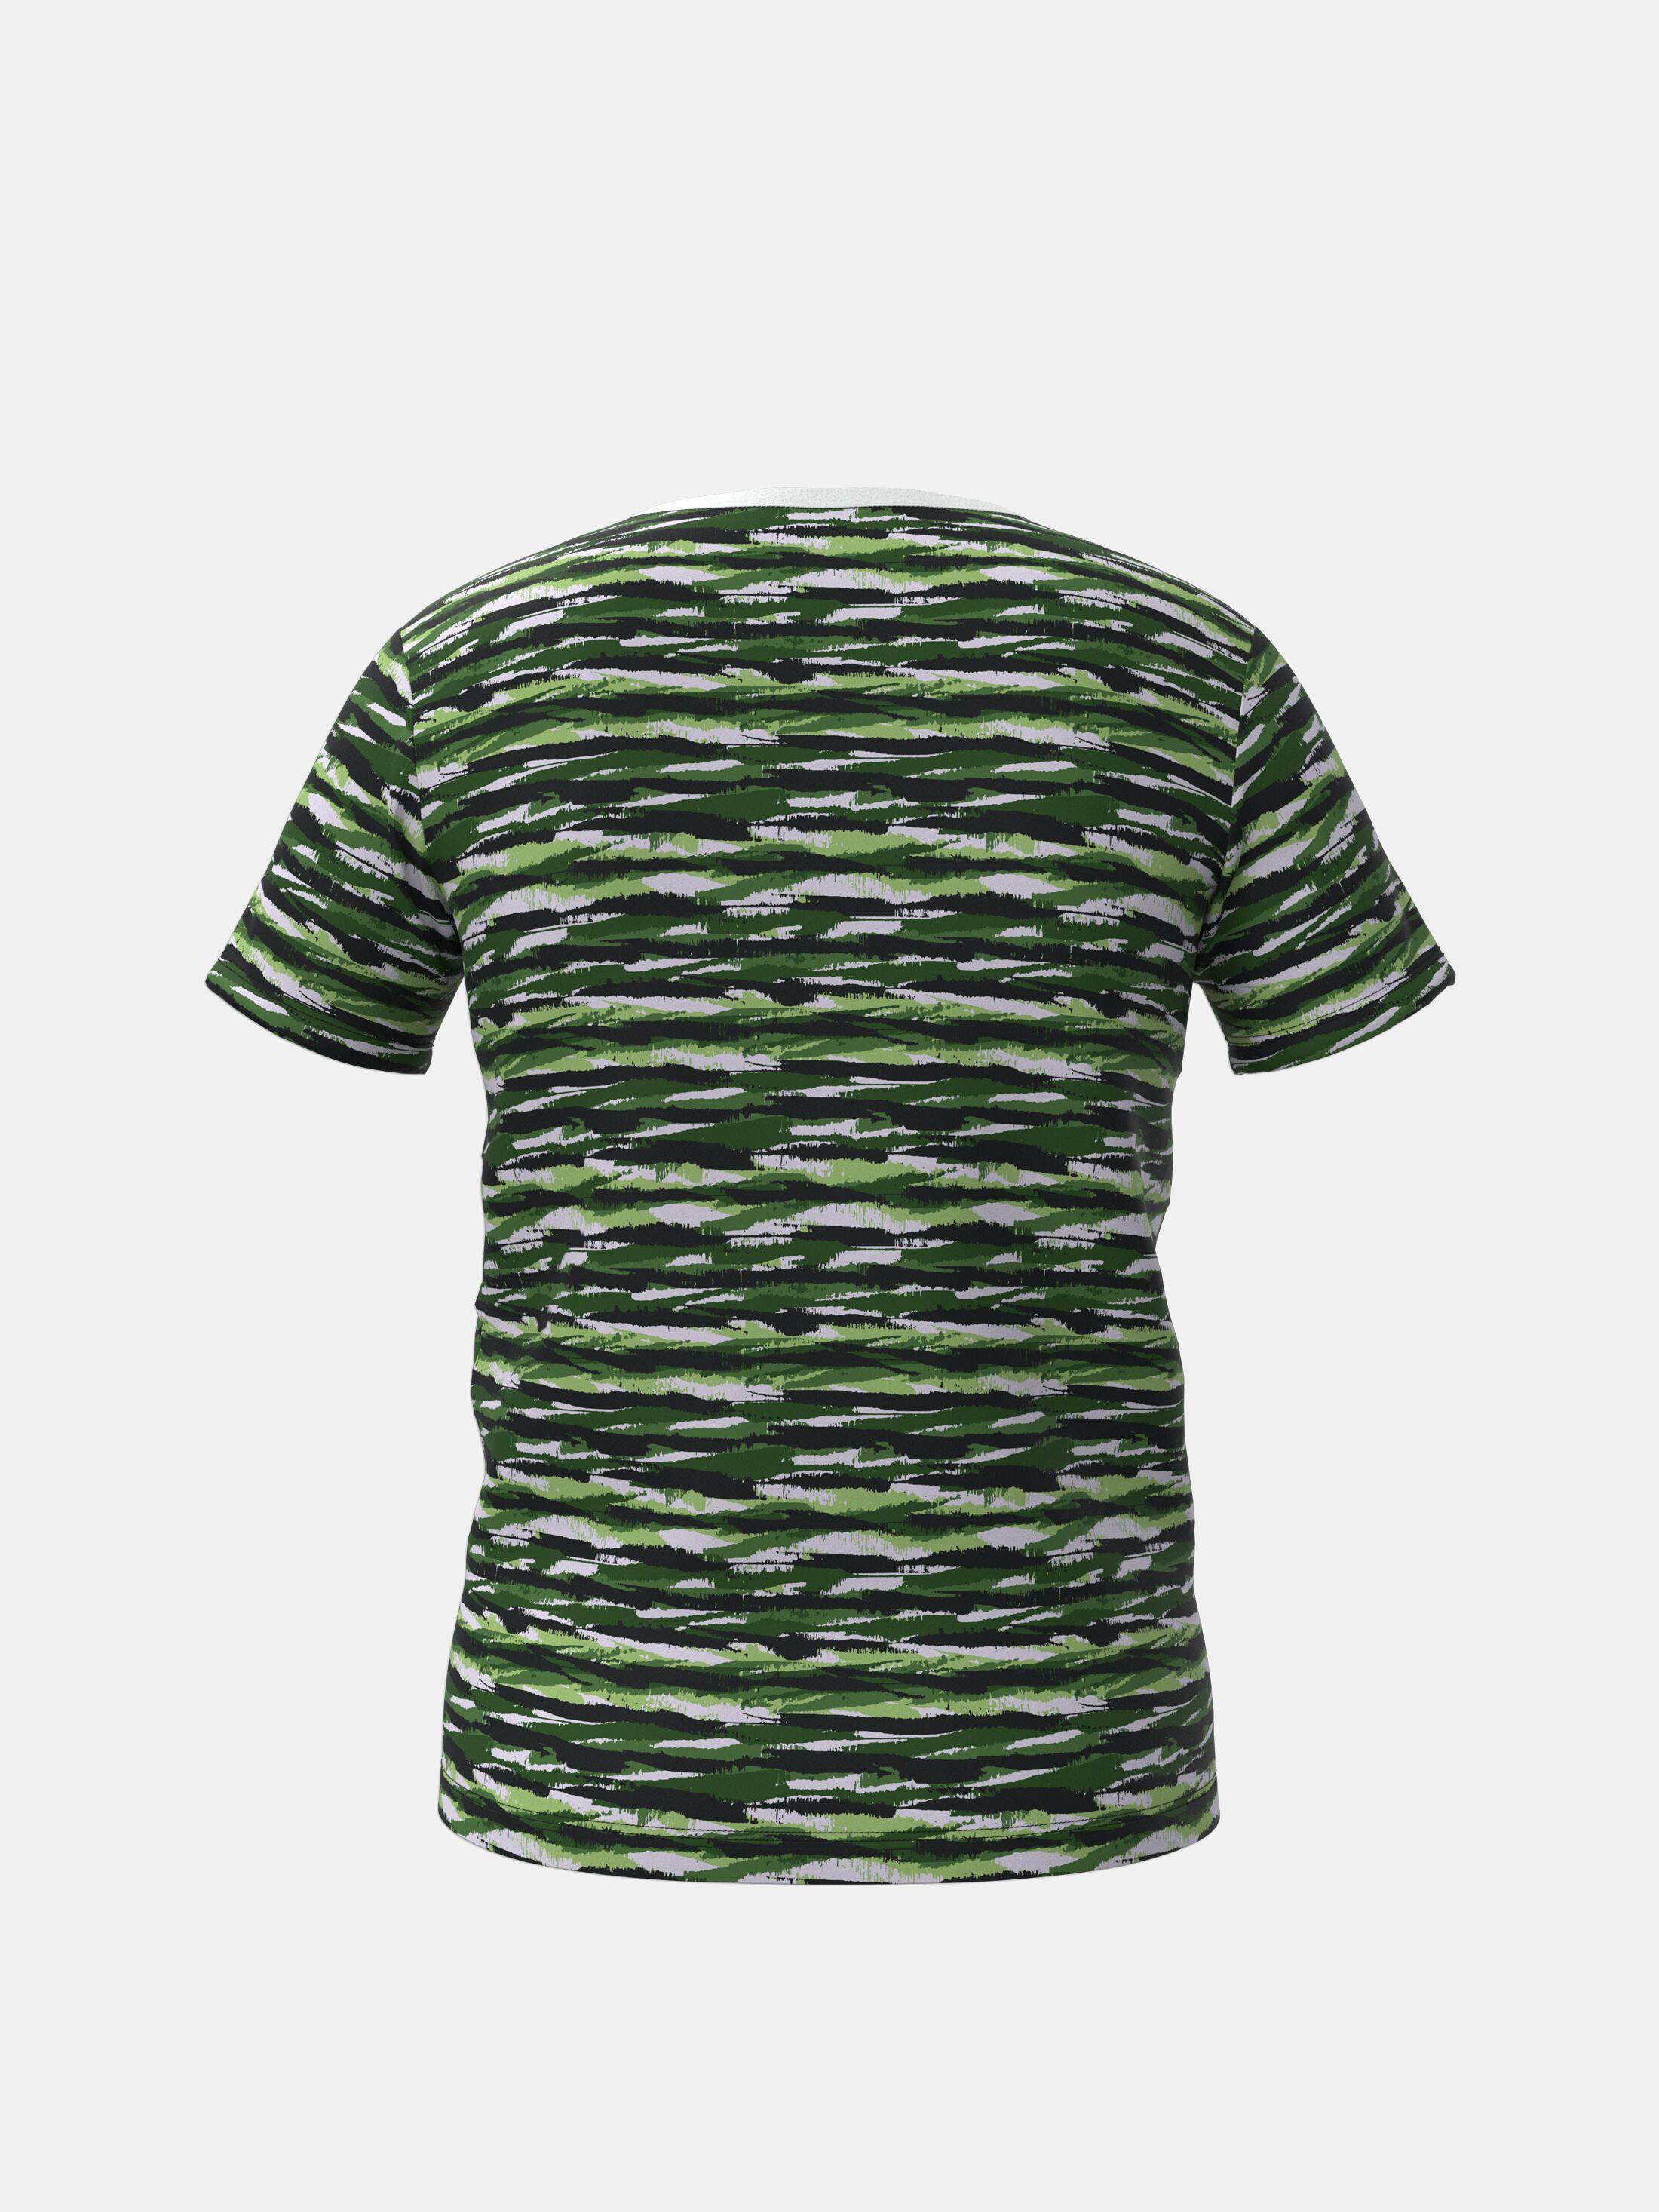 design your own kids t shirt